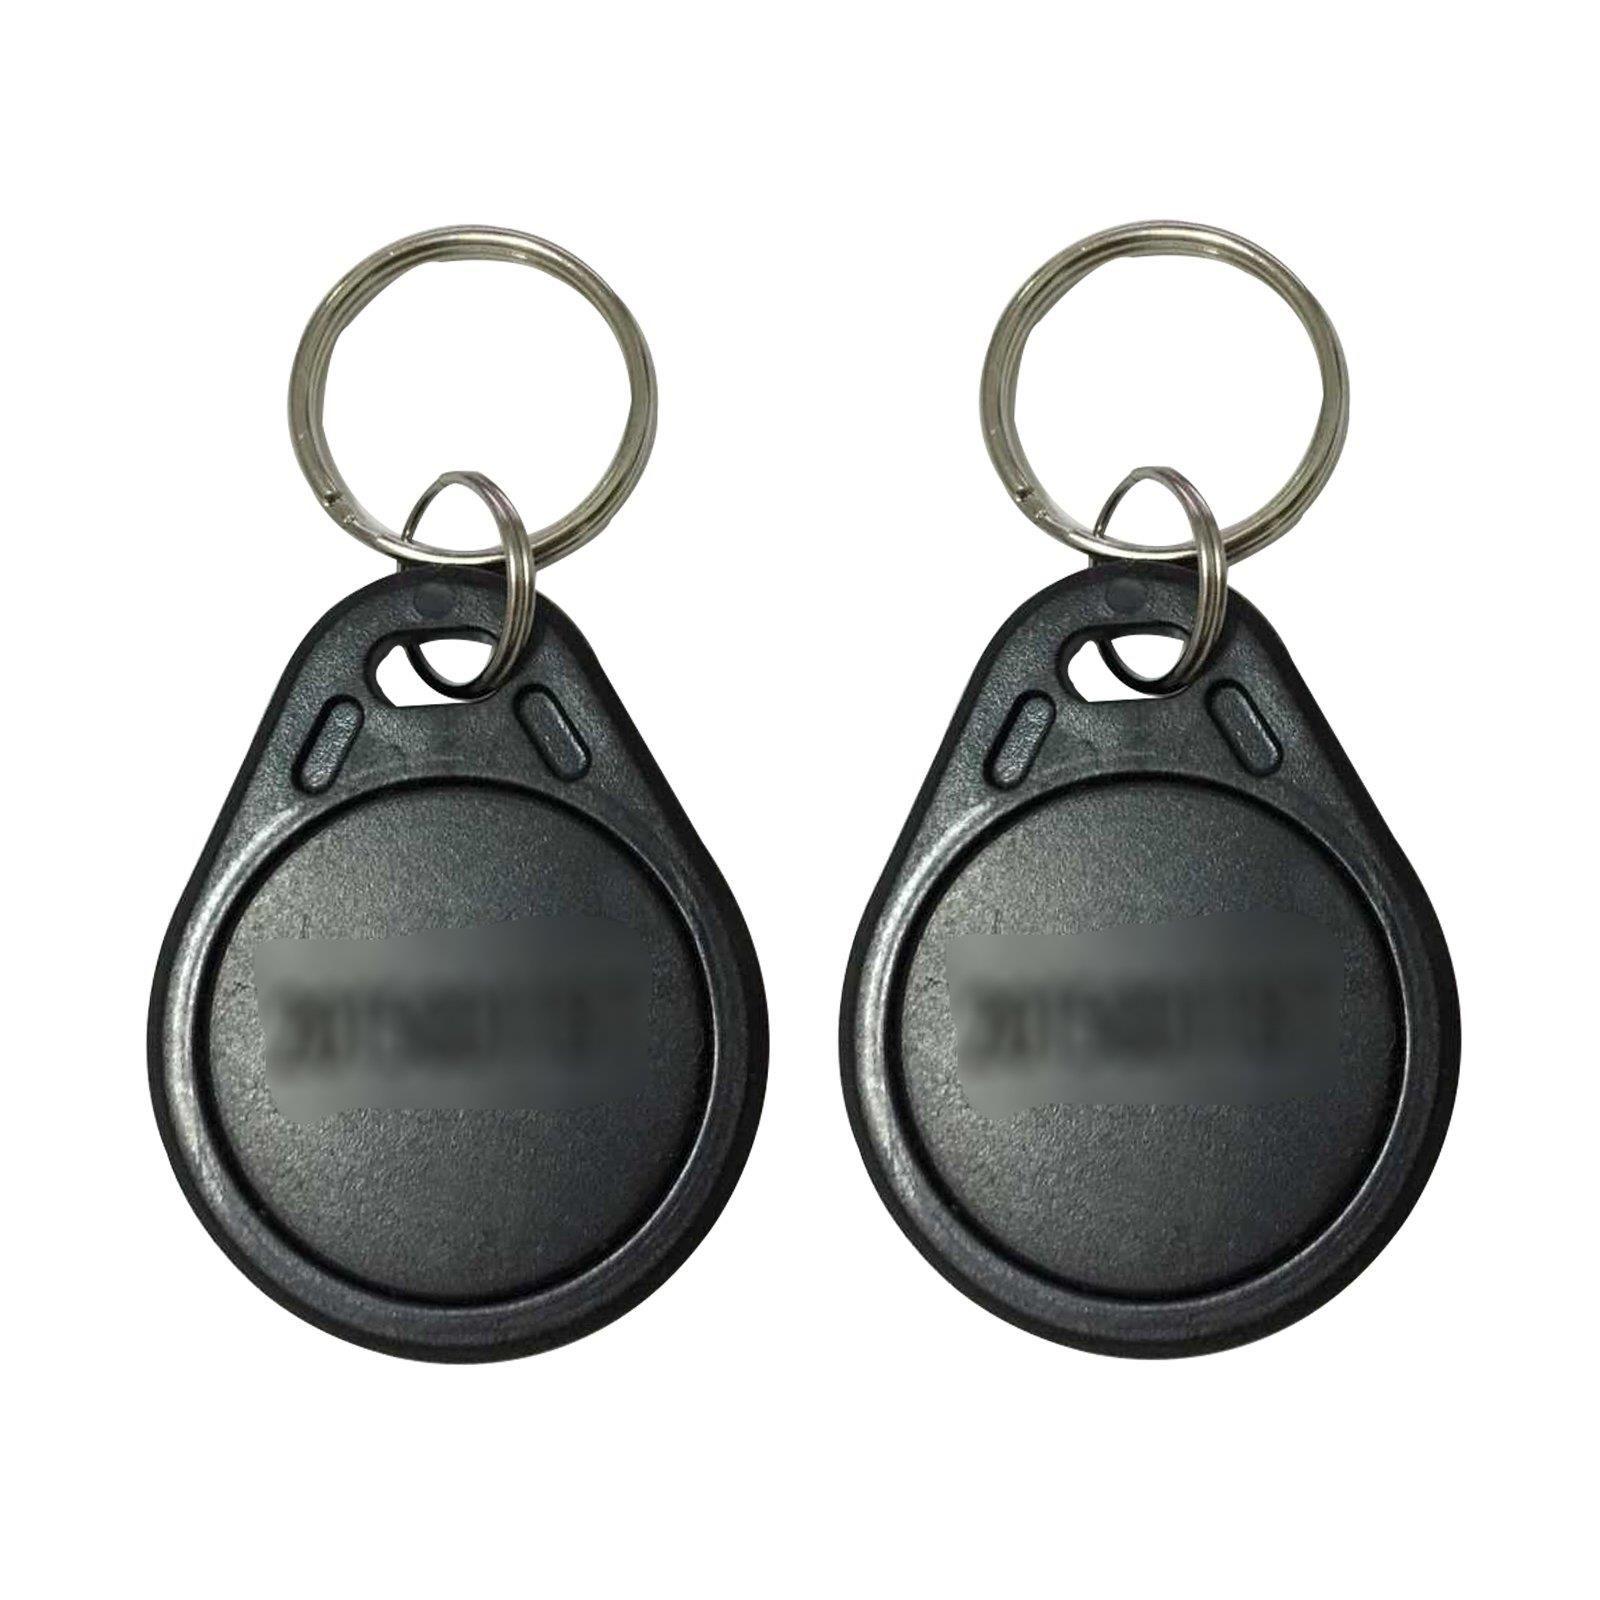 Rfid Proximity Tag Key Fob Door Entry Access Control System Work